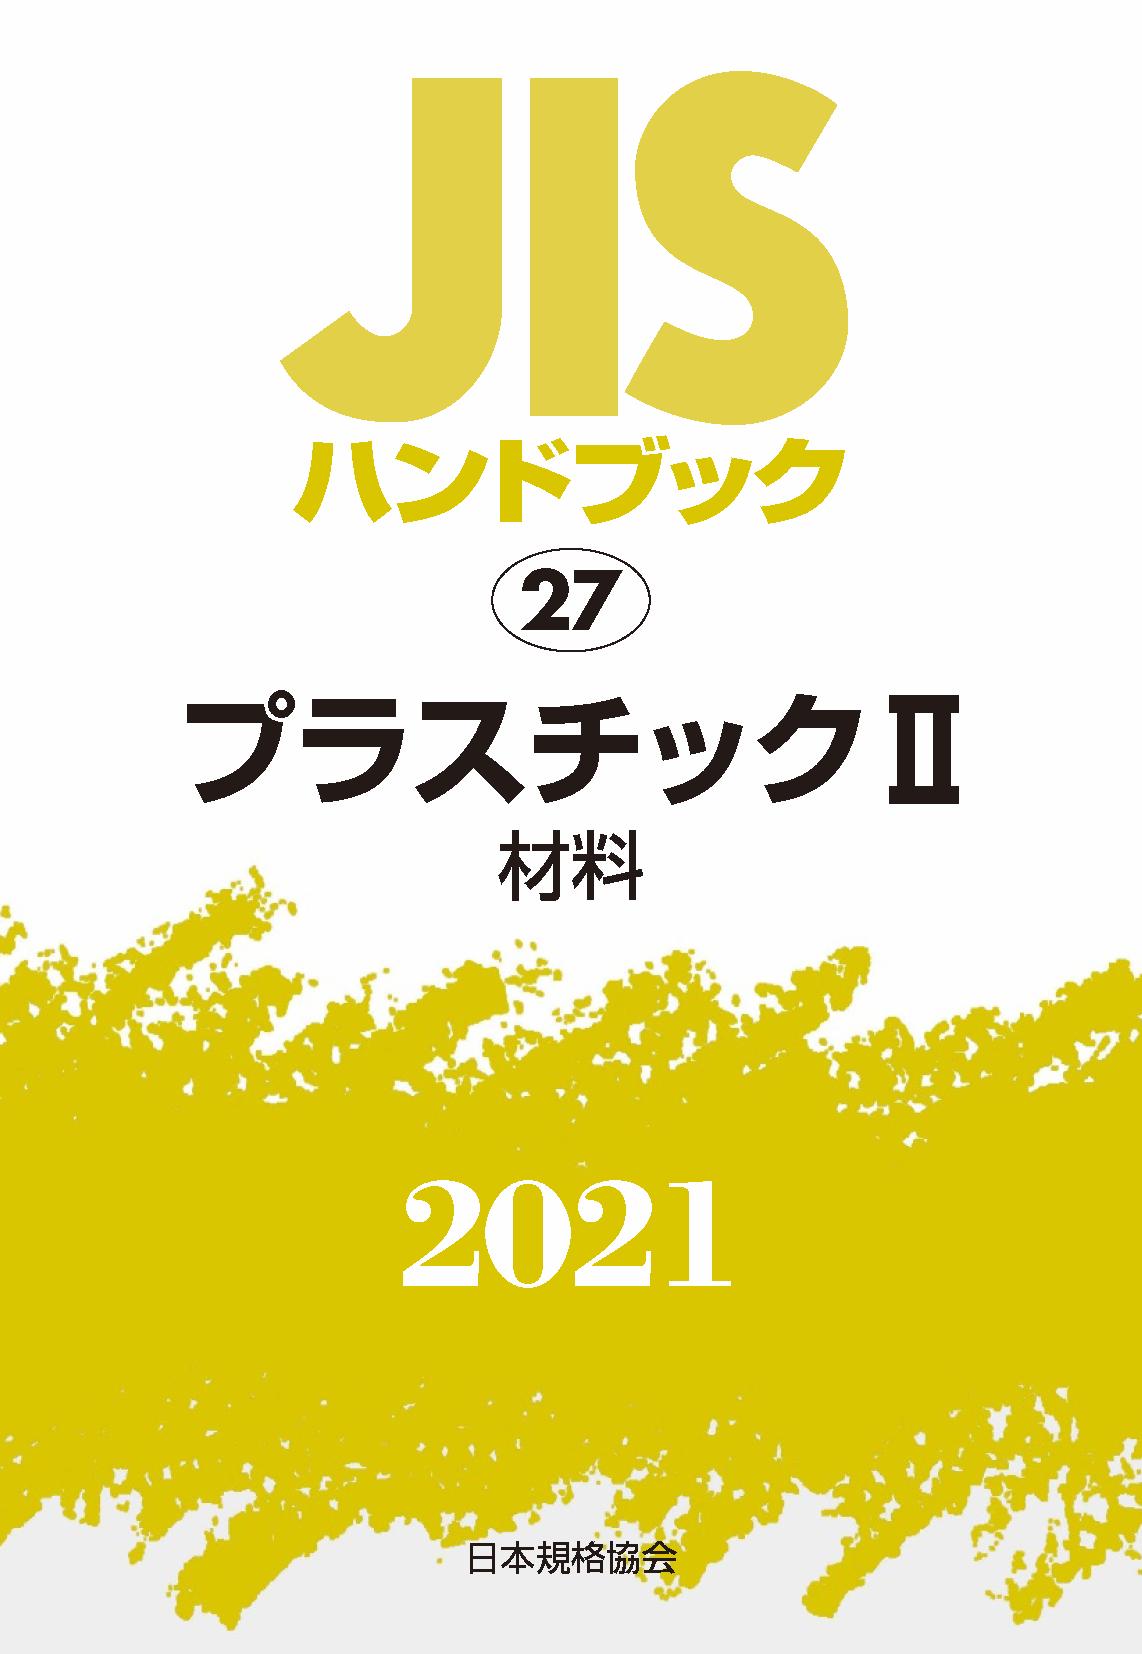 JIS HB 27 プラスチック II(材料) 2021   日本規格協会 JSA Group Webdesk